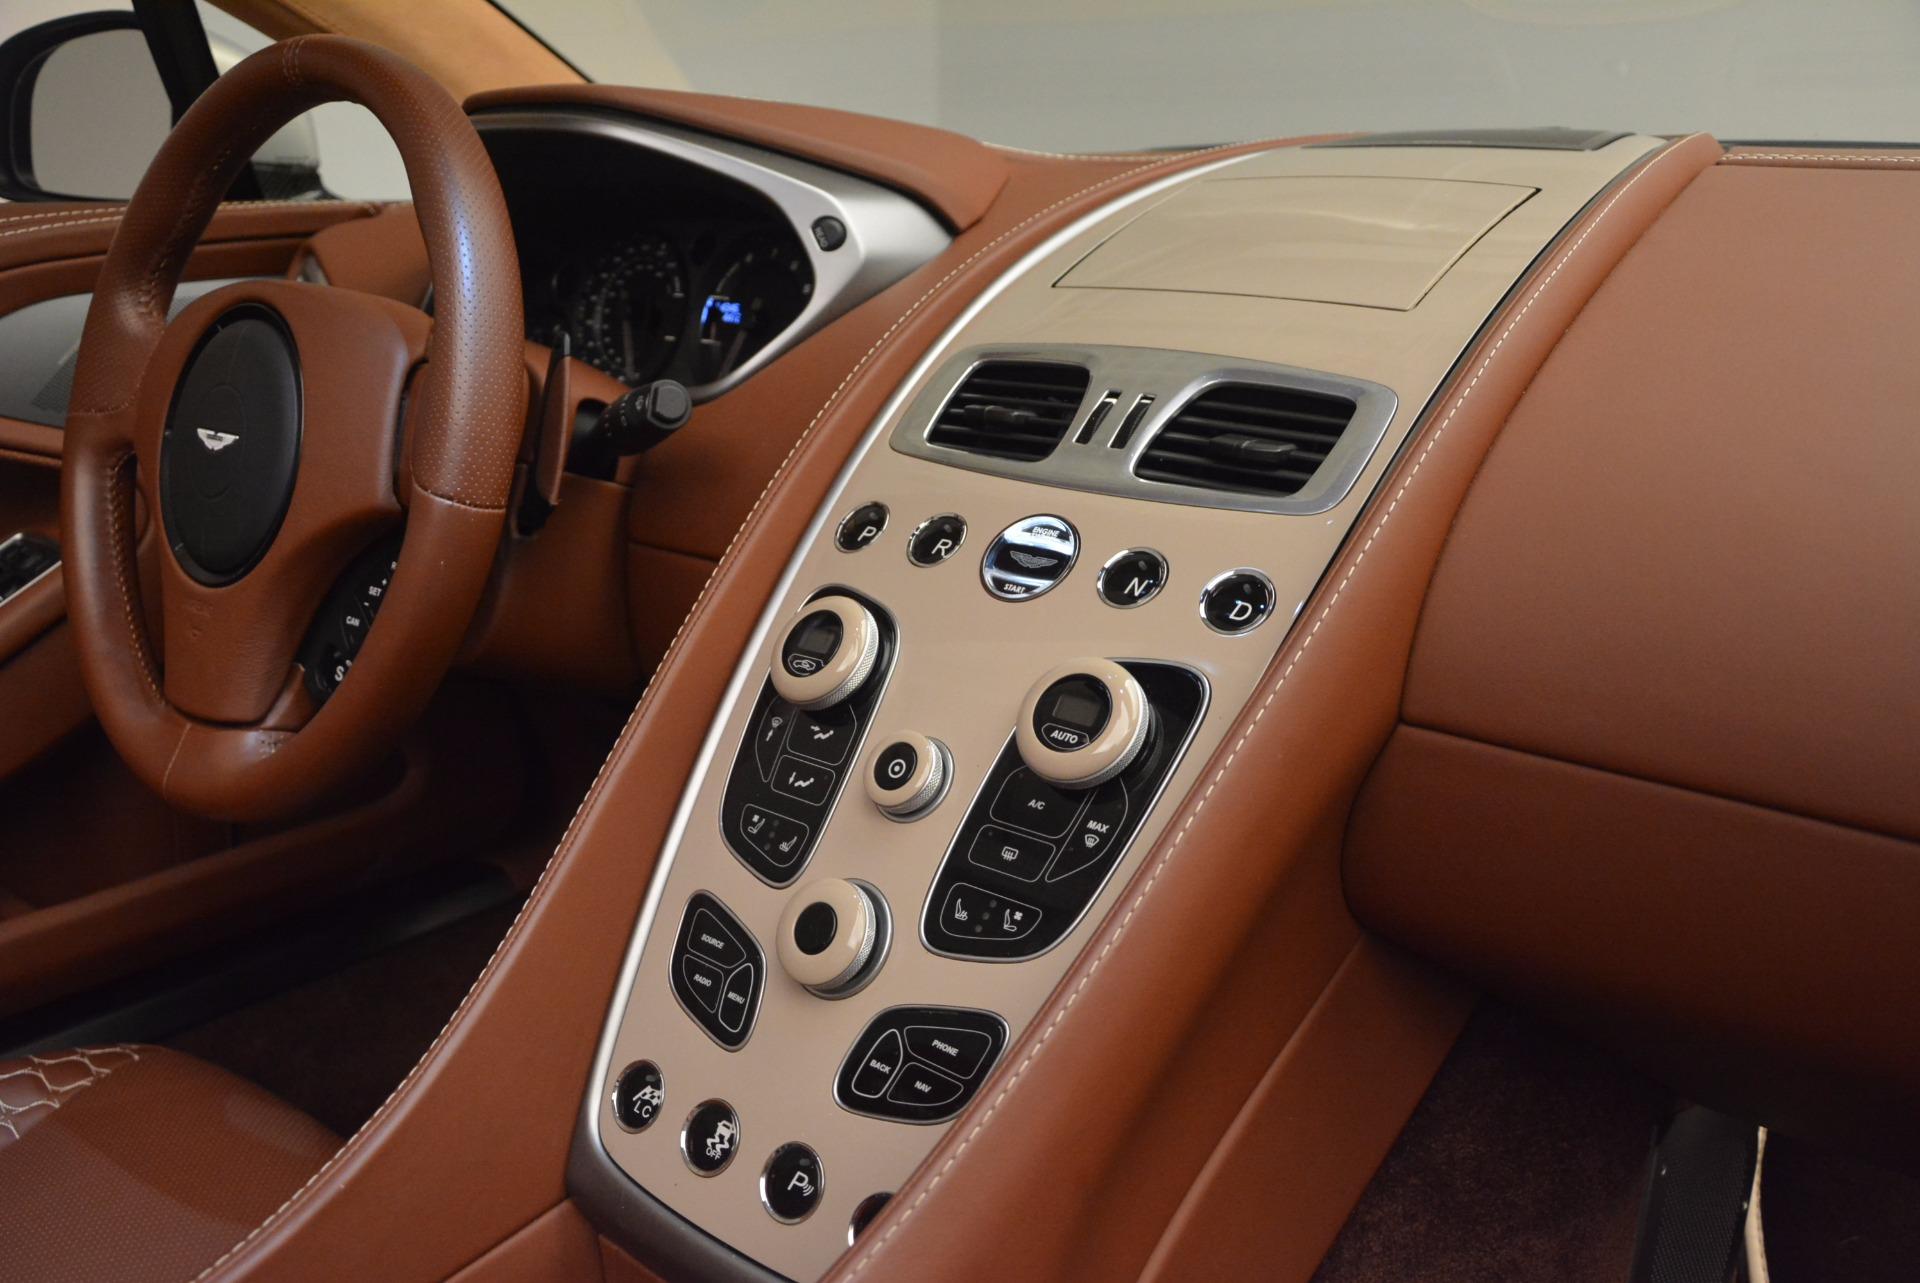 Used 2015 Aston Martin Vanquish Volante For Sale In Westport, CT 1448_p26